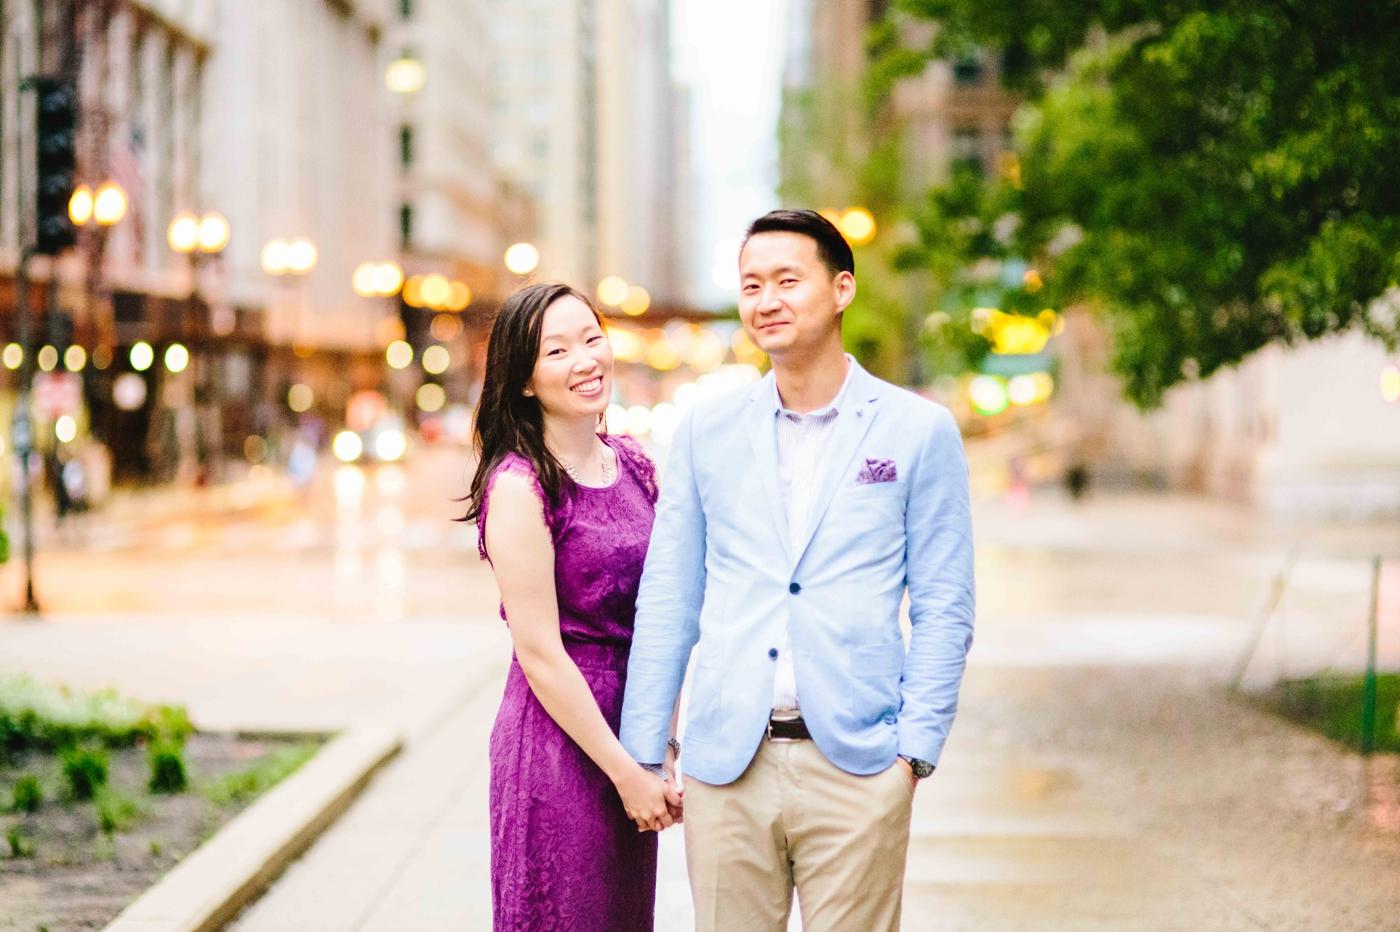 chicago-fine-art-wedding-photography-raysilvia17